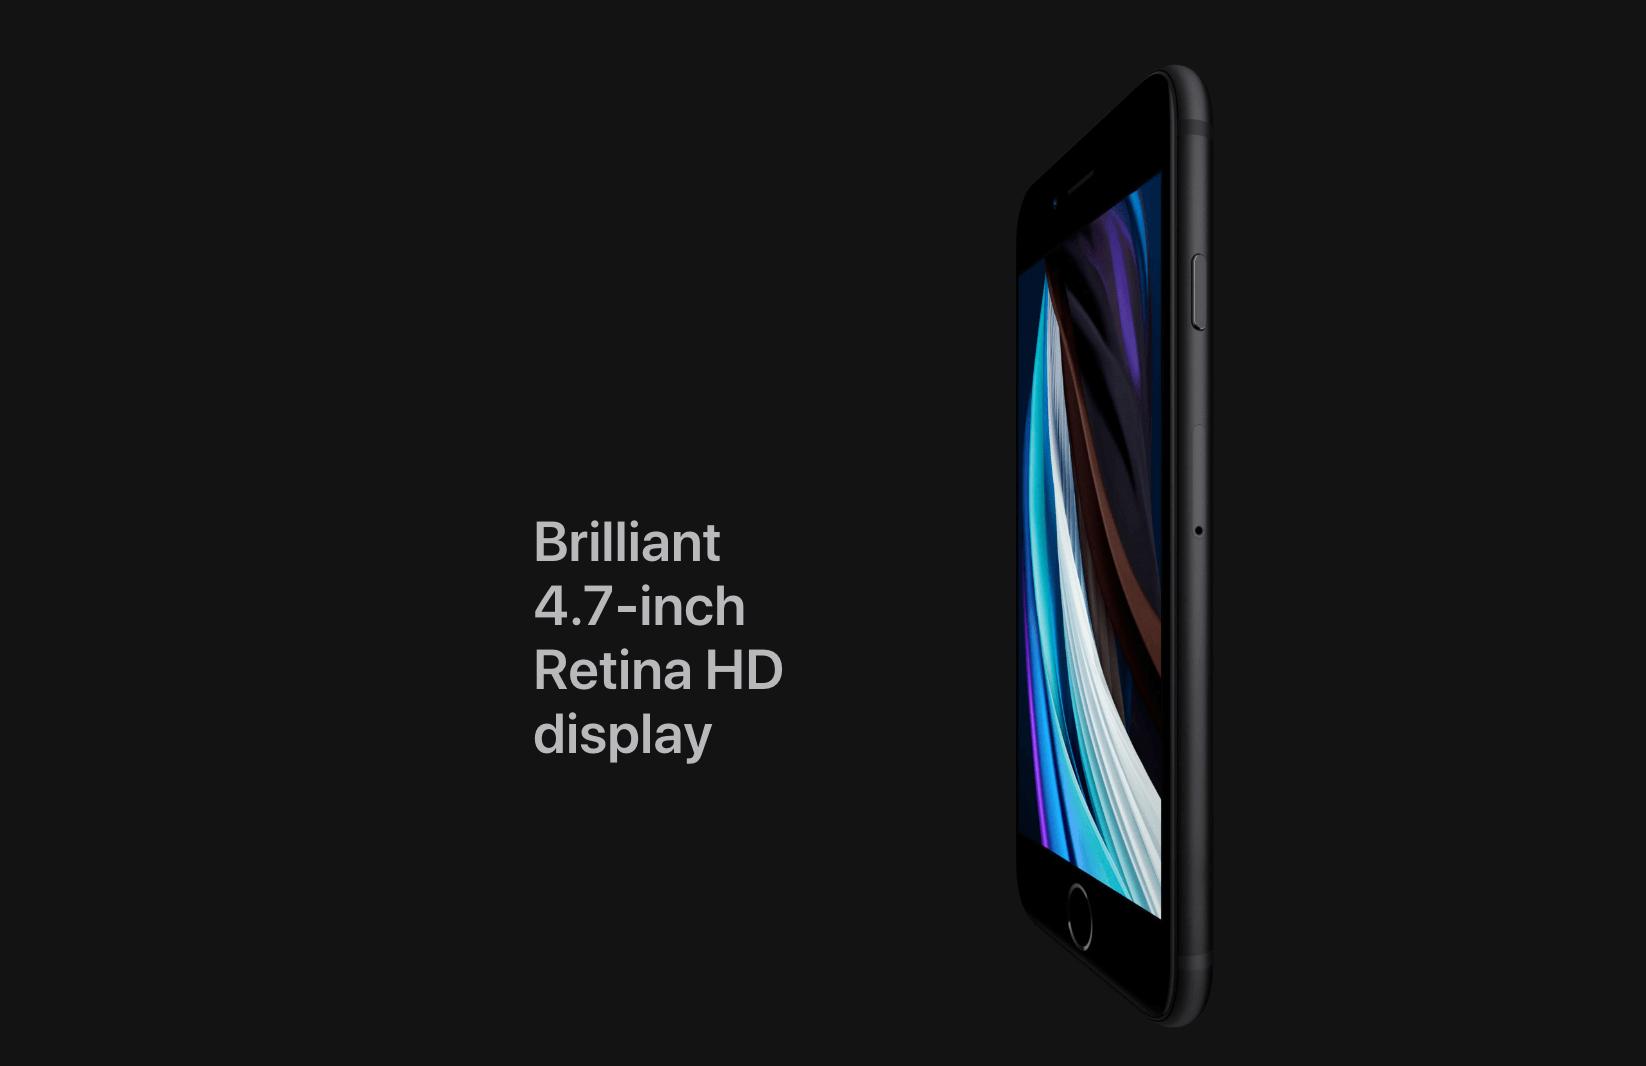 iPhone SE 2020 Brilliant 4.7-inch Retina HD display